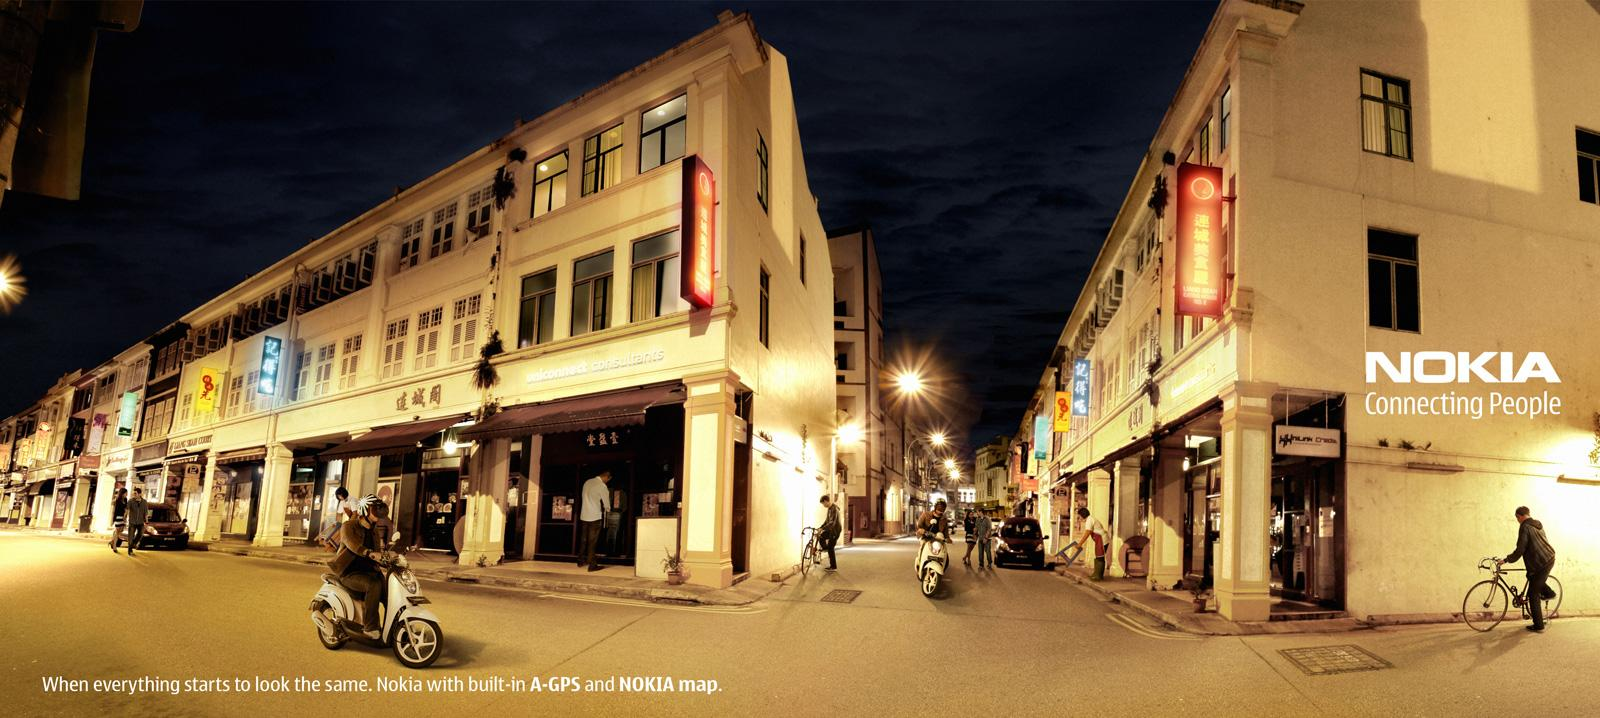 Nokia Outdoor Ad -  Night